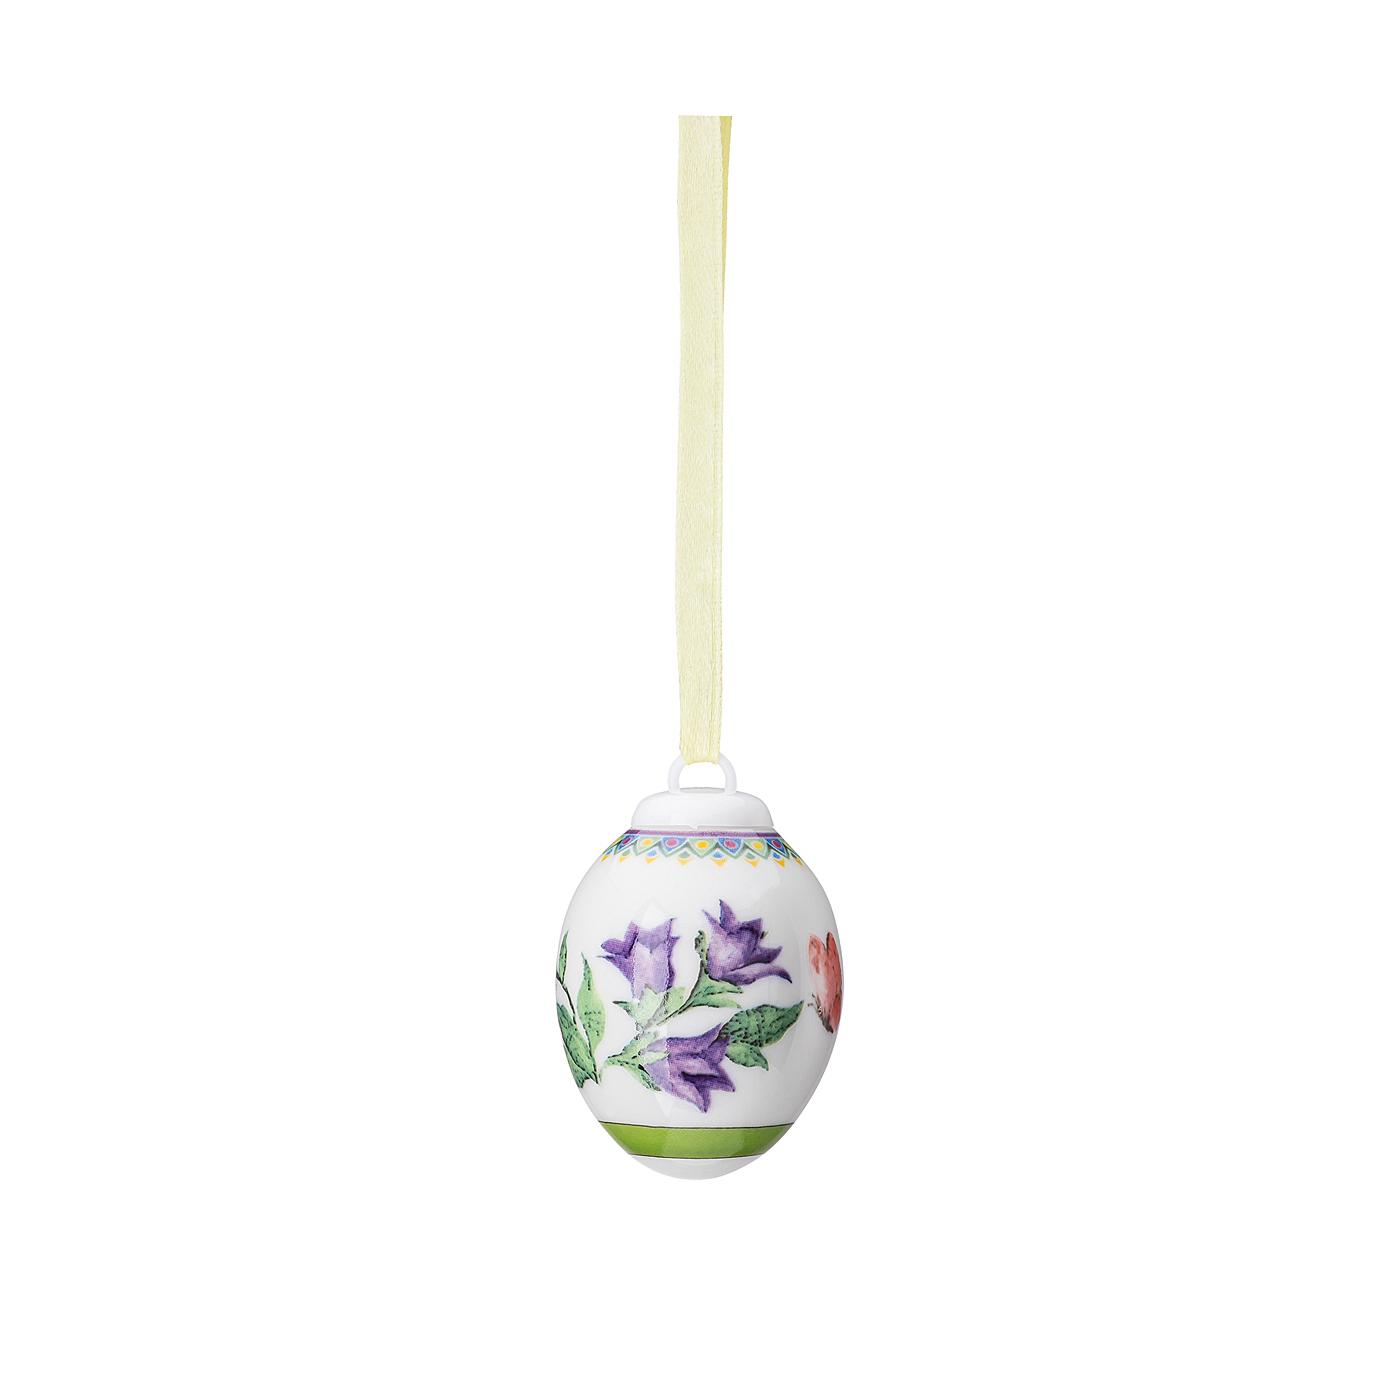 Porzellan-Mini-Ei Frühlingswiese Glockenblume Hutschenreuther